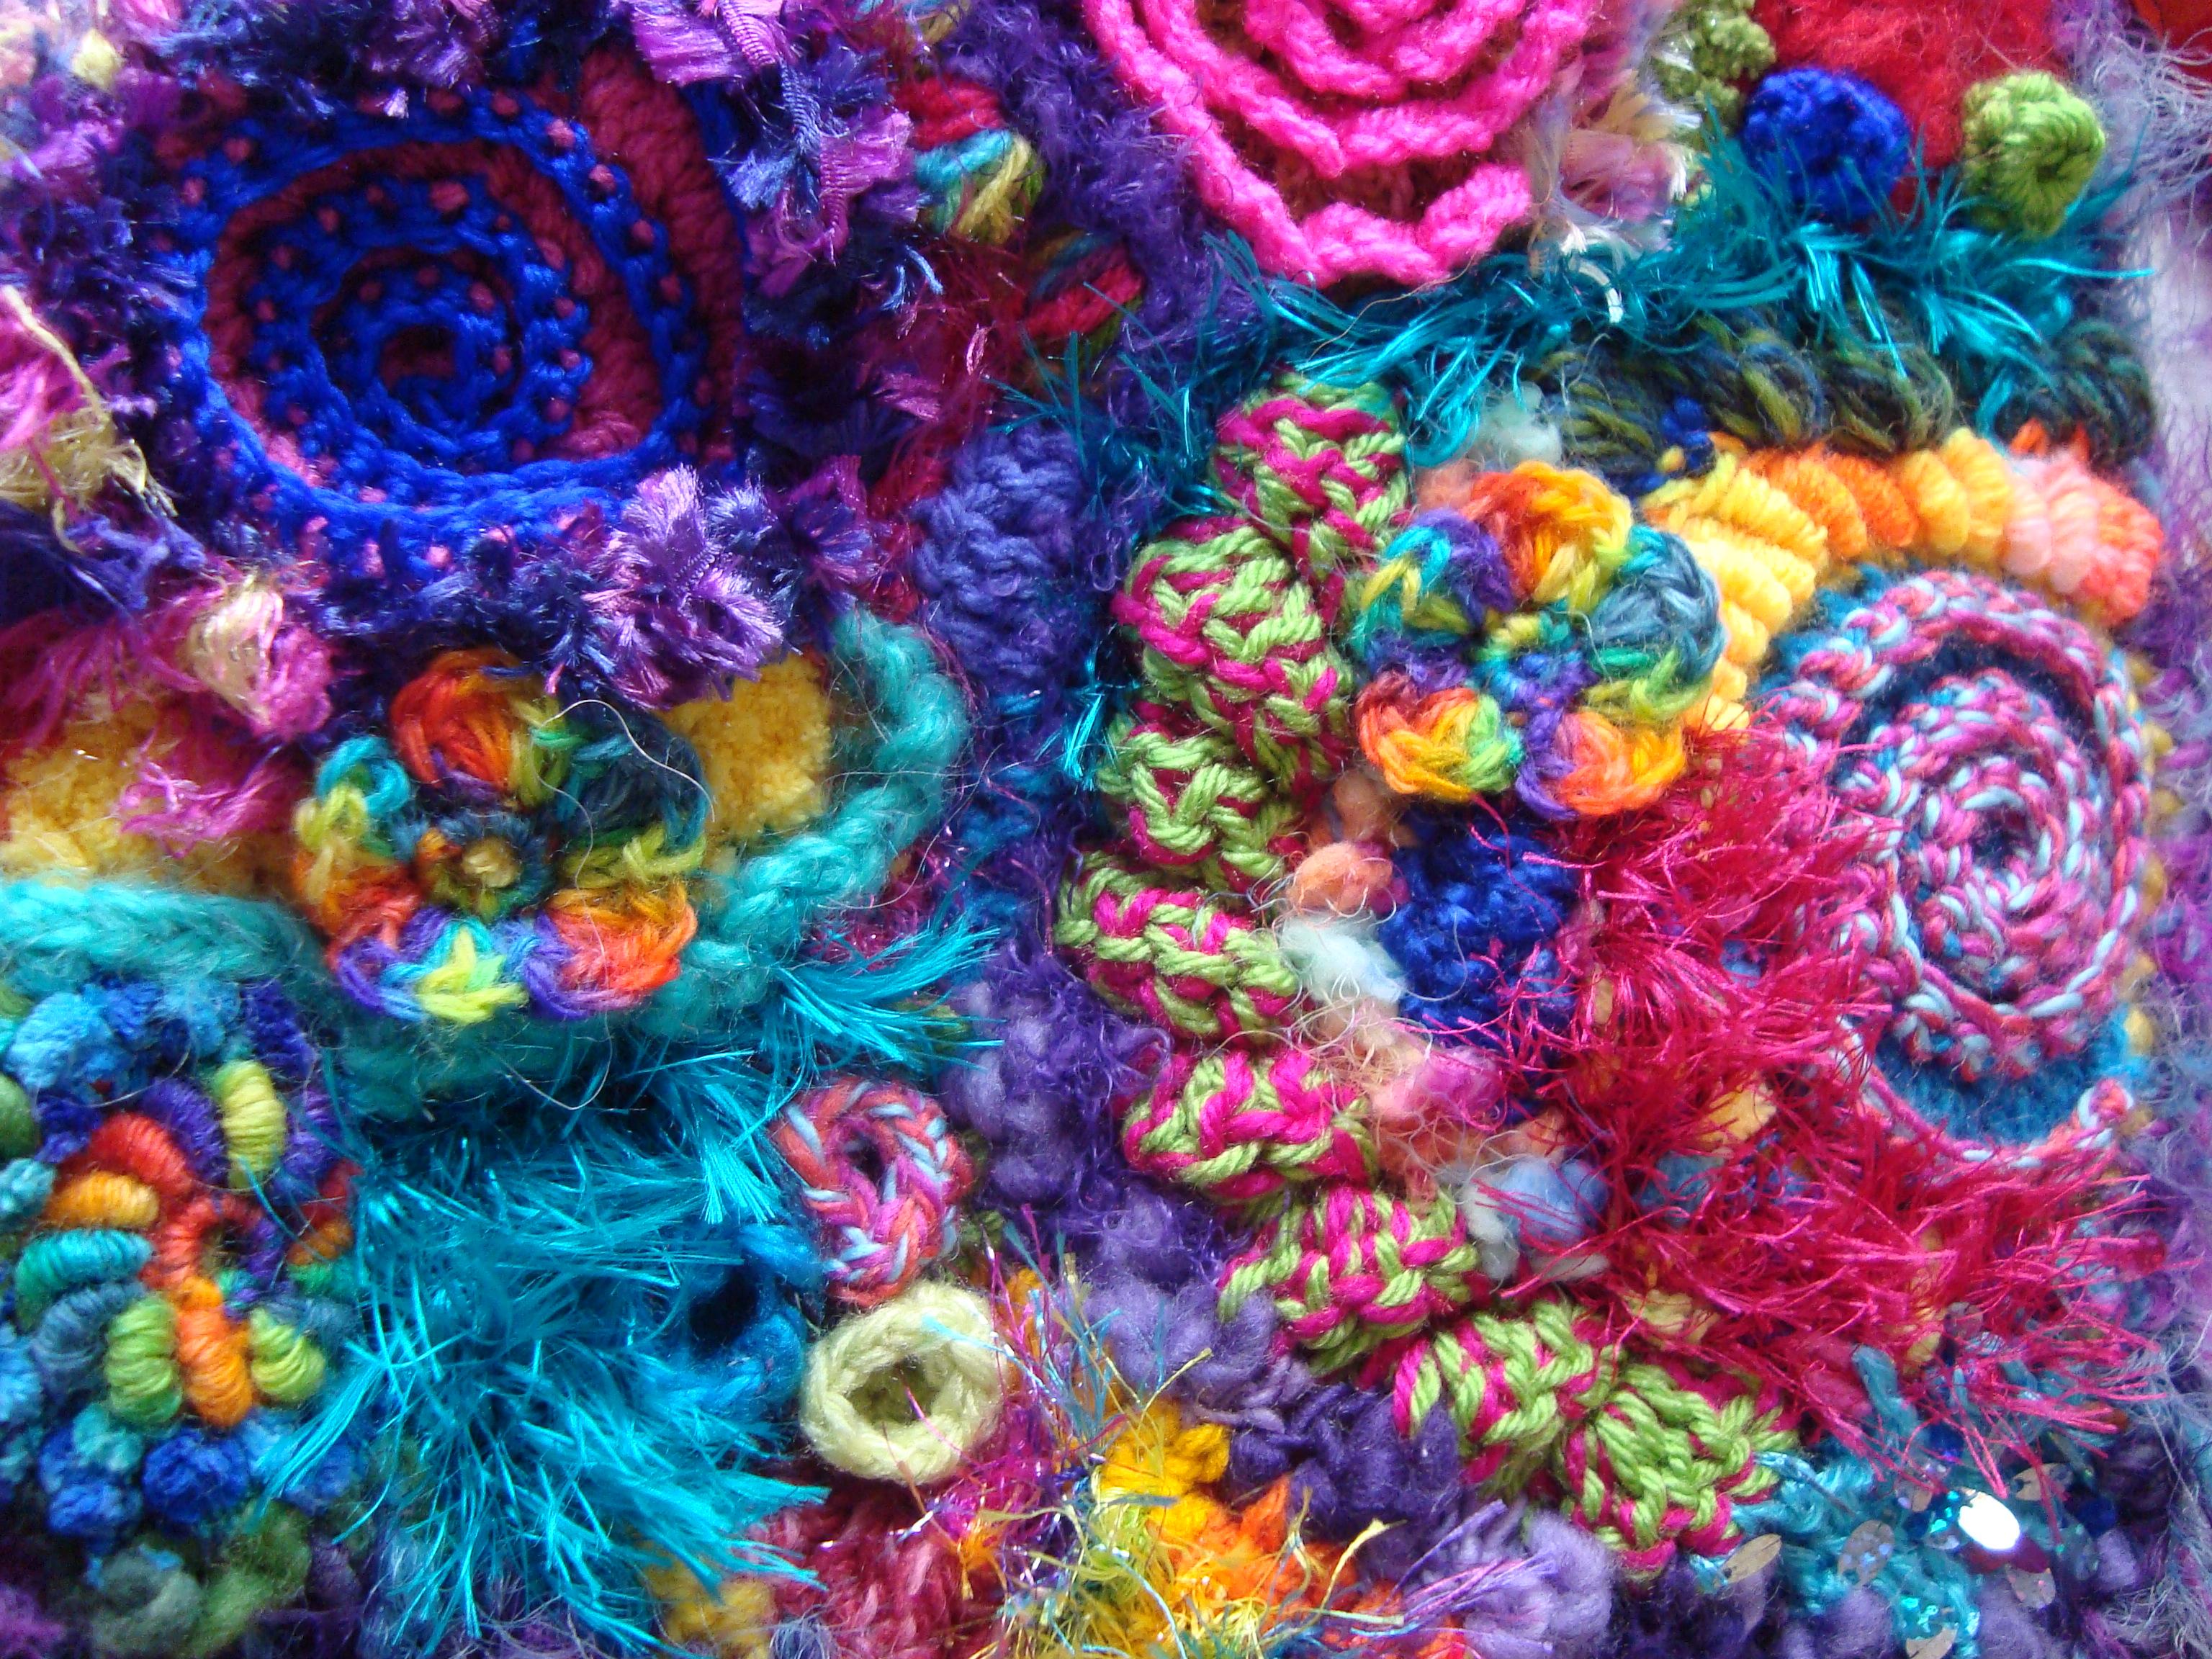 Crochet Rainbow Bag 5 by Faeriegem on DeviantArt